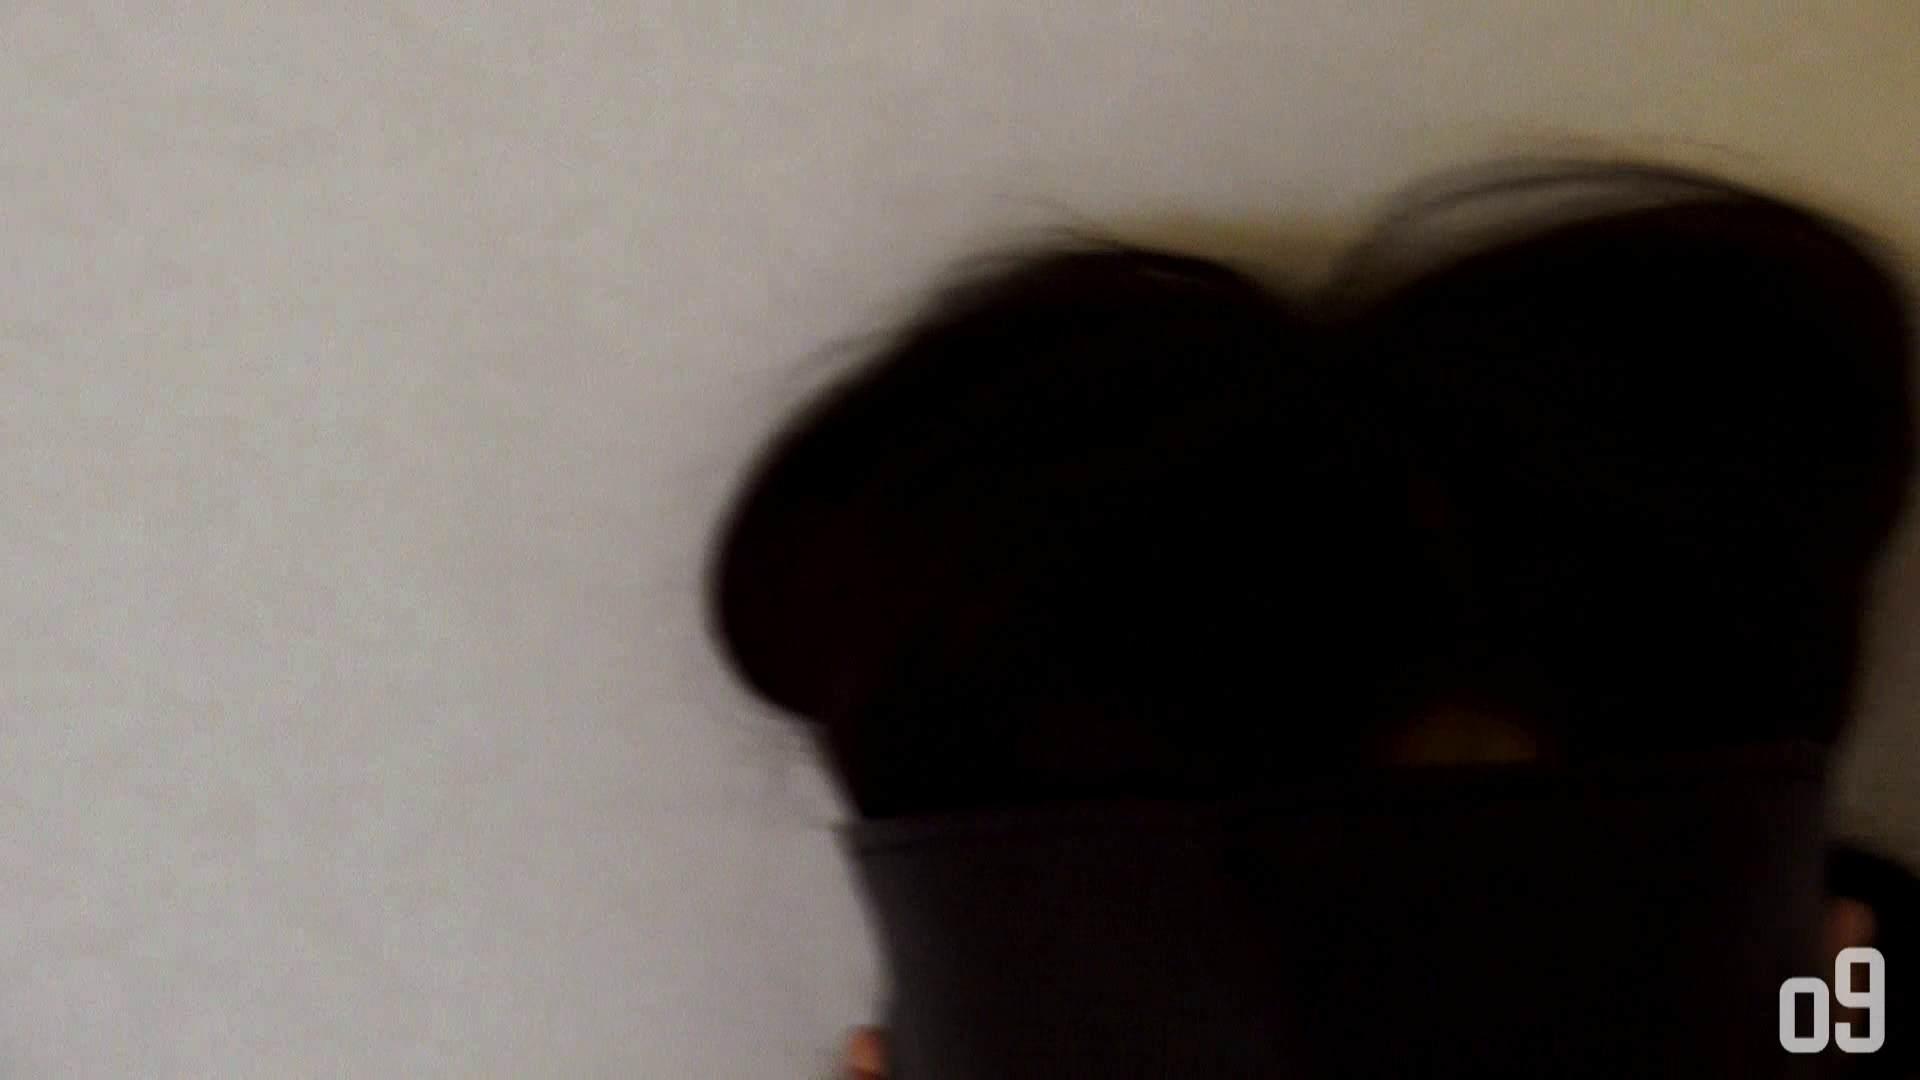 vol.6 TKSさんが震える!留華ちゃんの不慣れな手コキで念願の射精! ギャル攻め | 要望受付  89画像 51